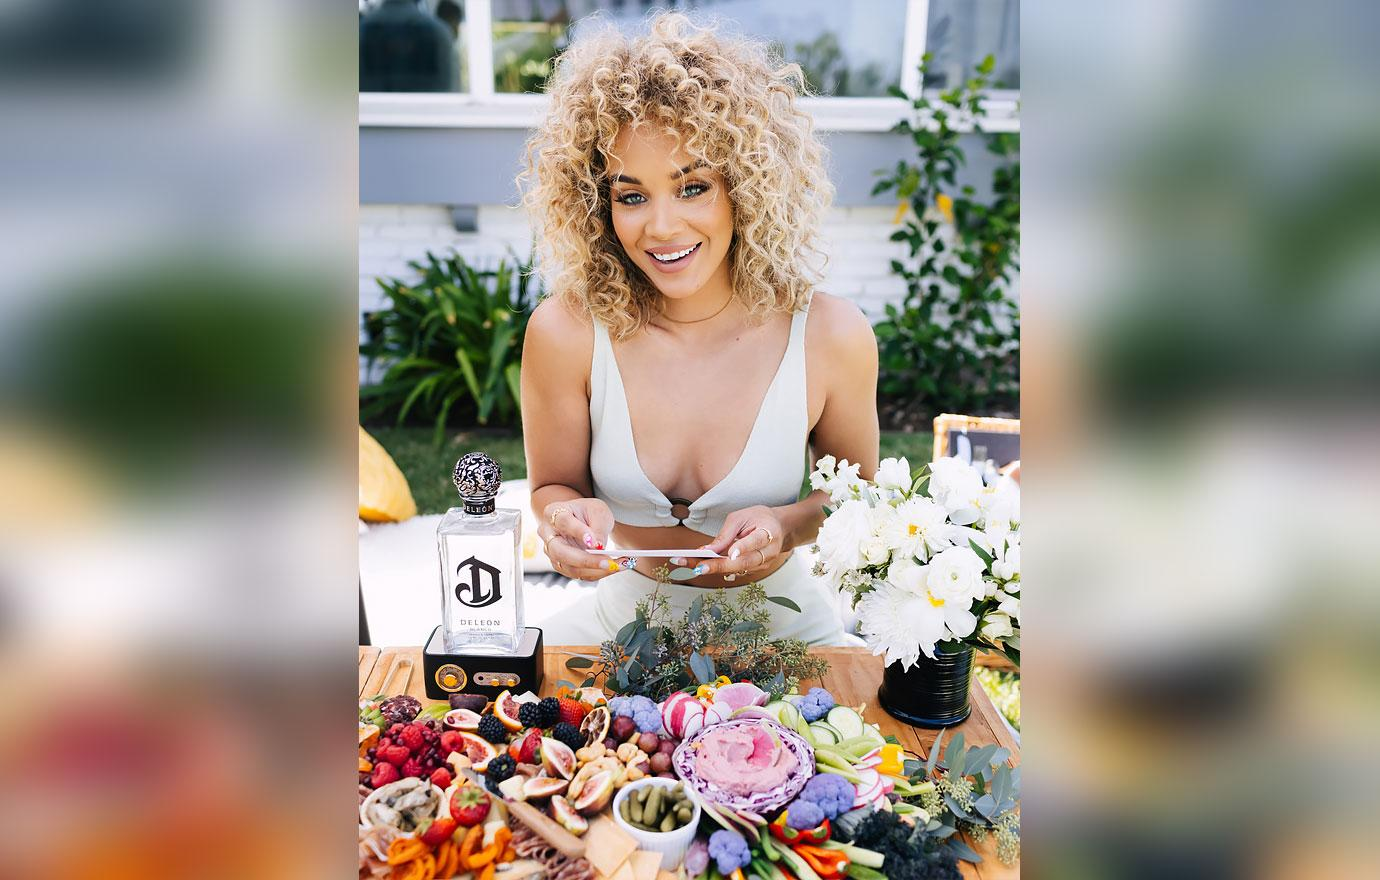 jasmine sanders endless summer picnic deleon tequila